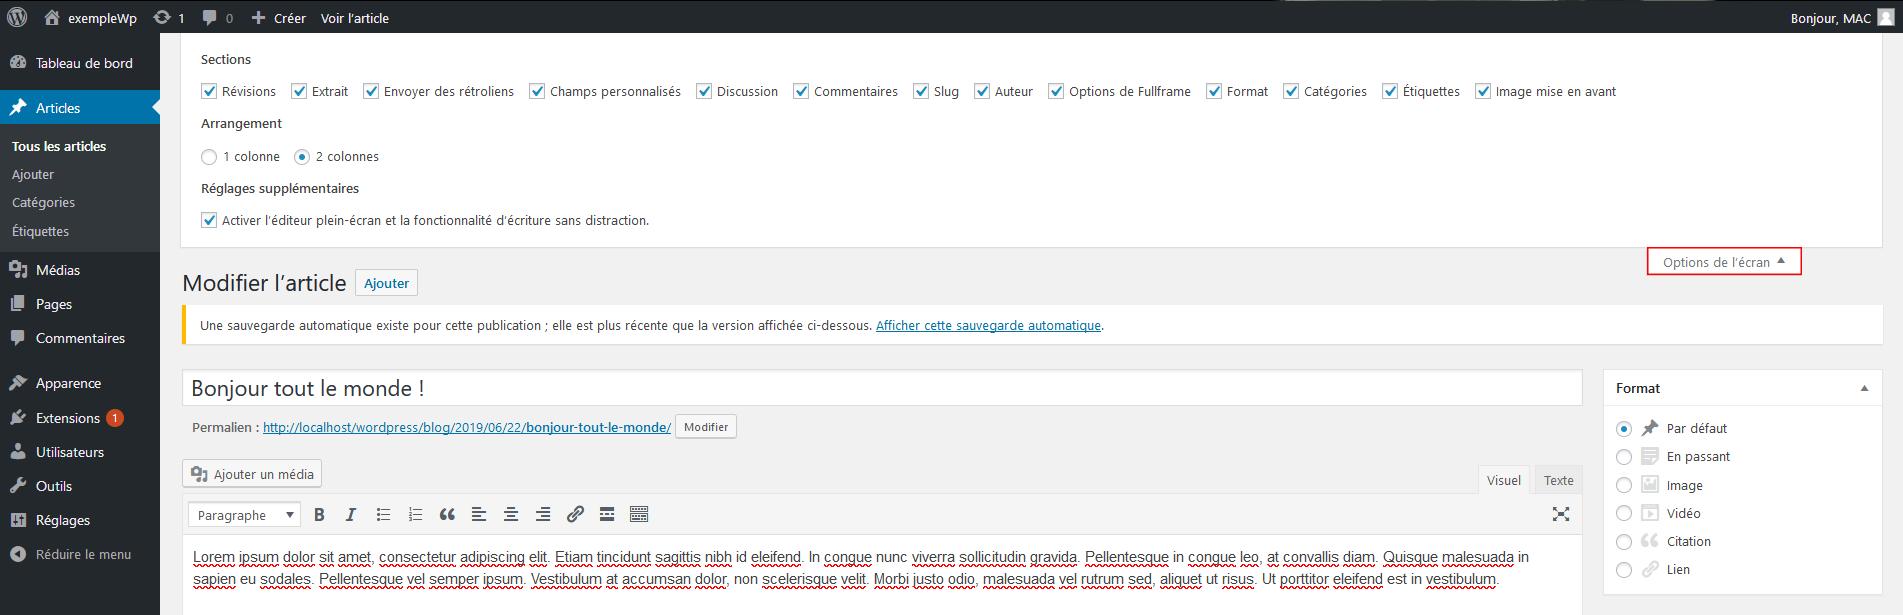 Option de l'écran dans WordPress